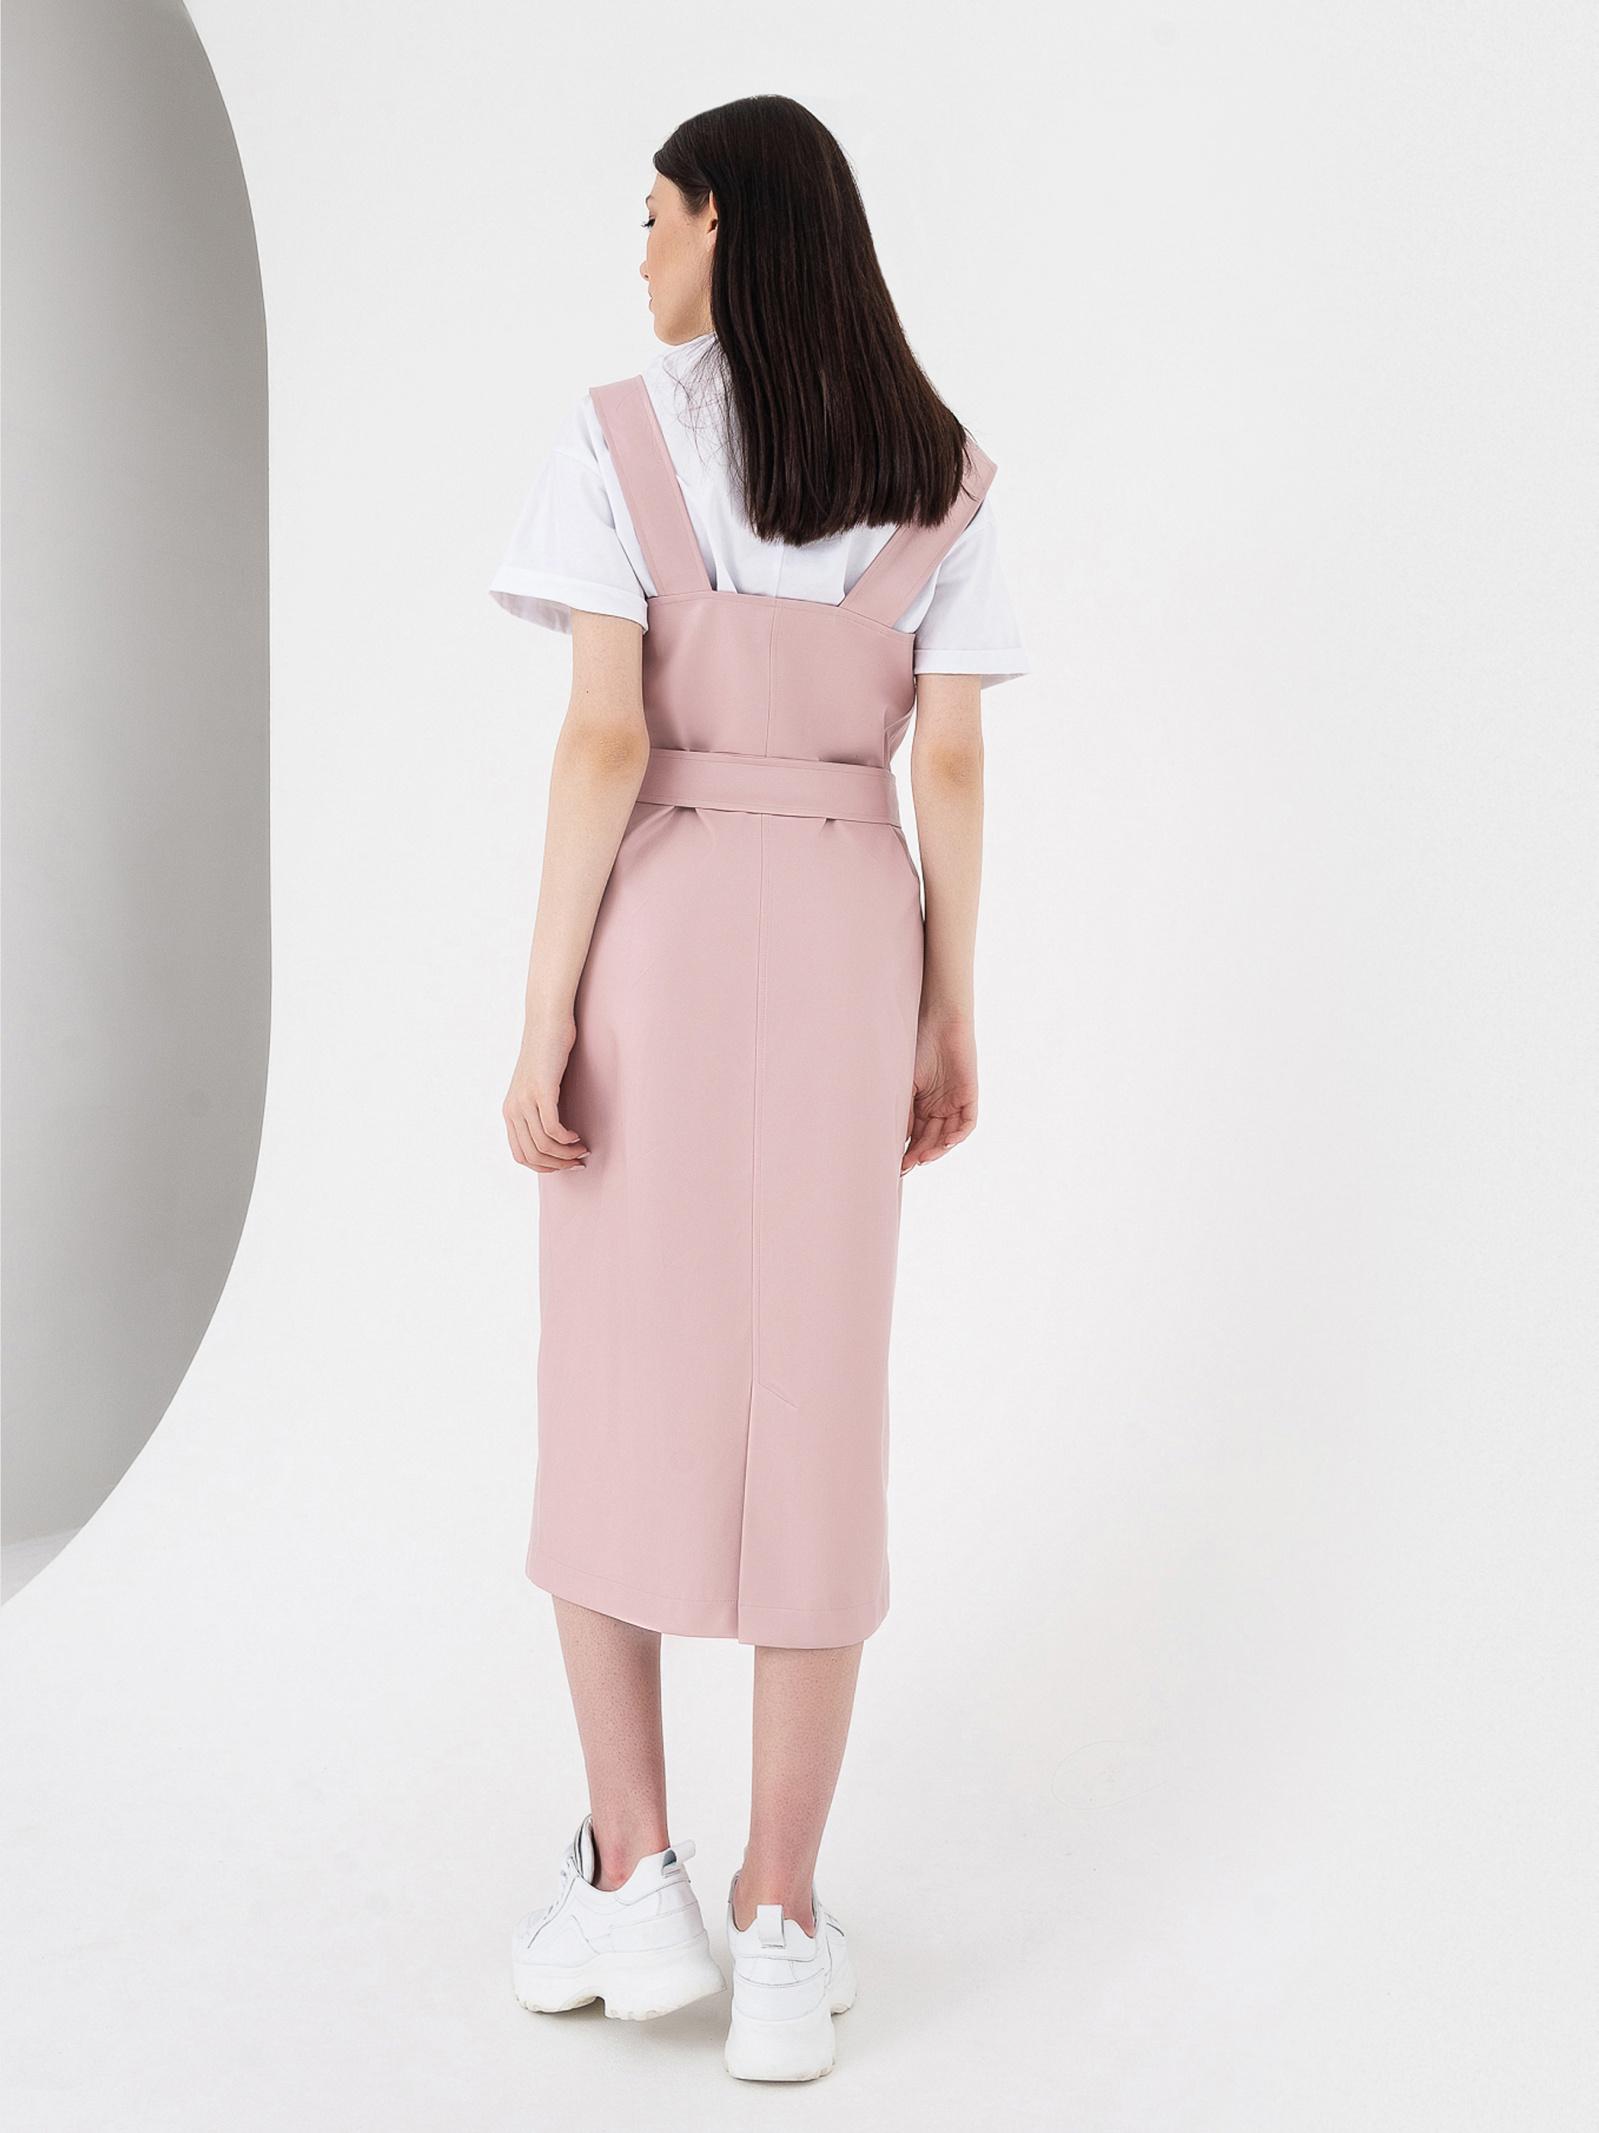 VOVK Сарафан жіночі модель 07494 пудровий якість, 2017